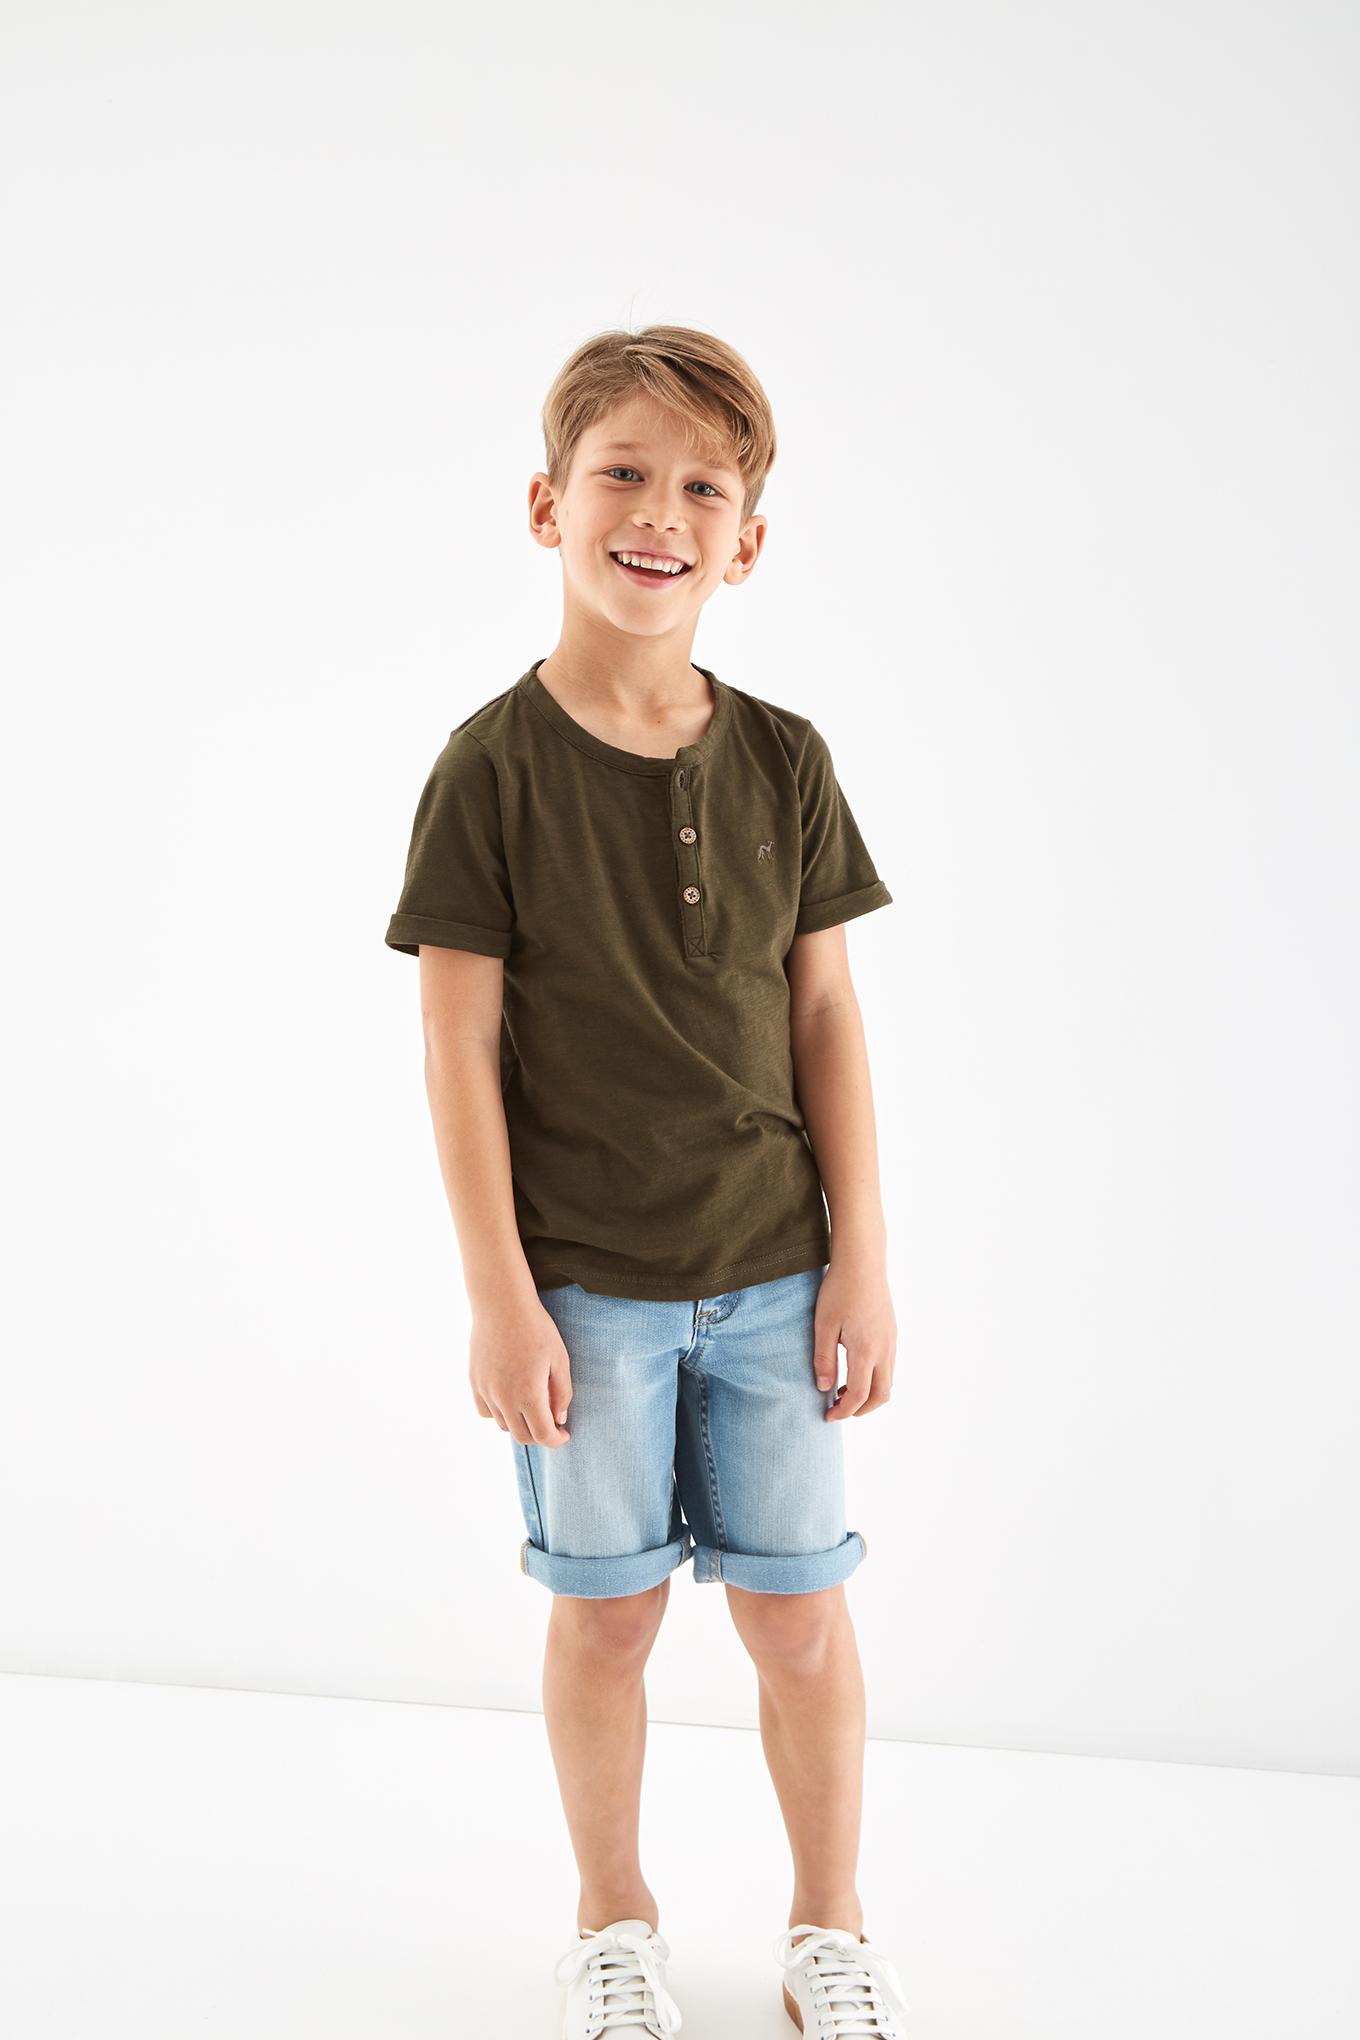 T-Shirt Khaki Sport Boy